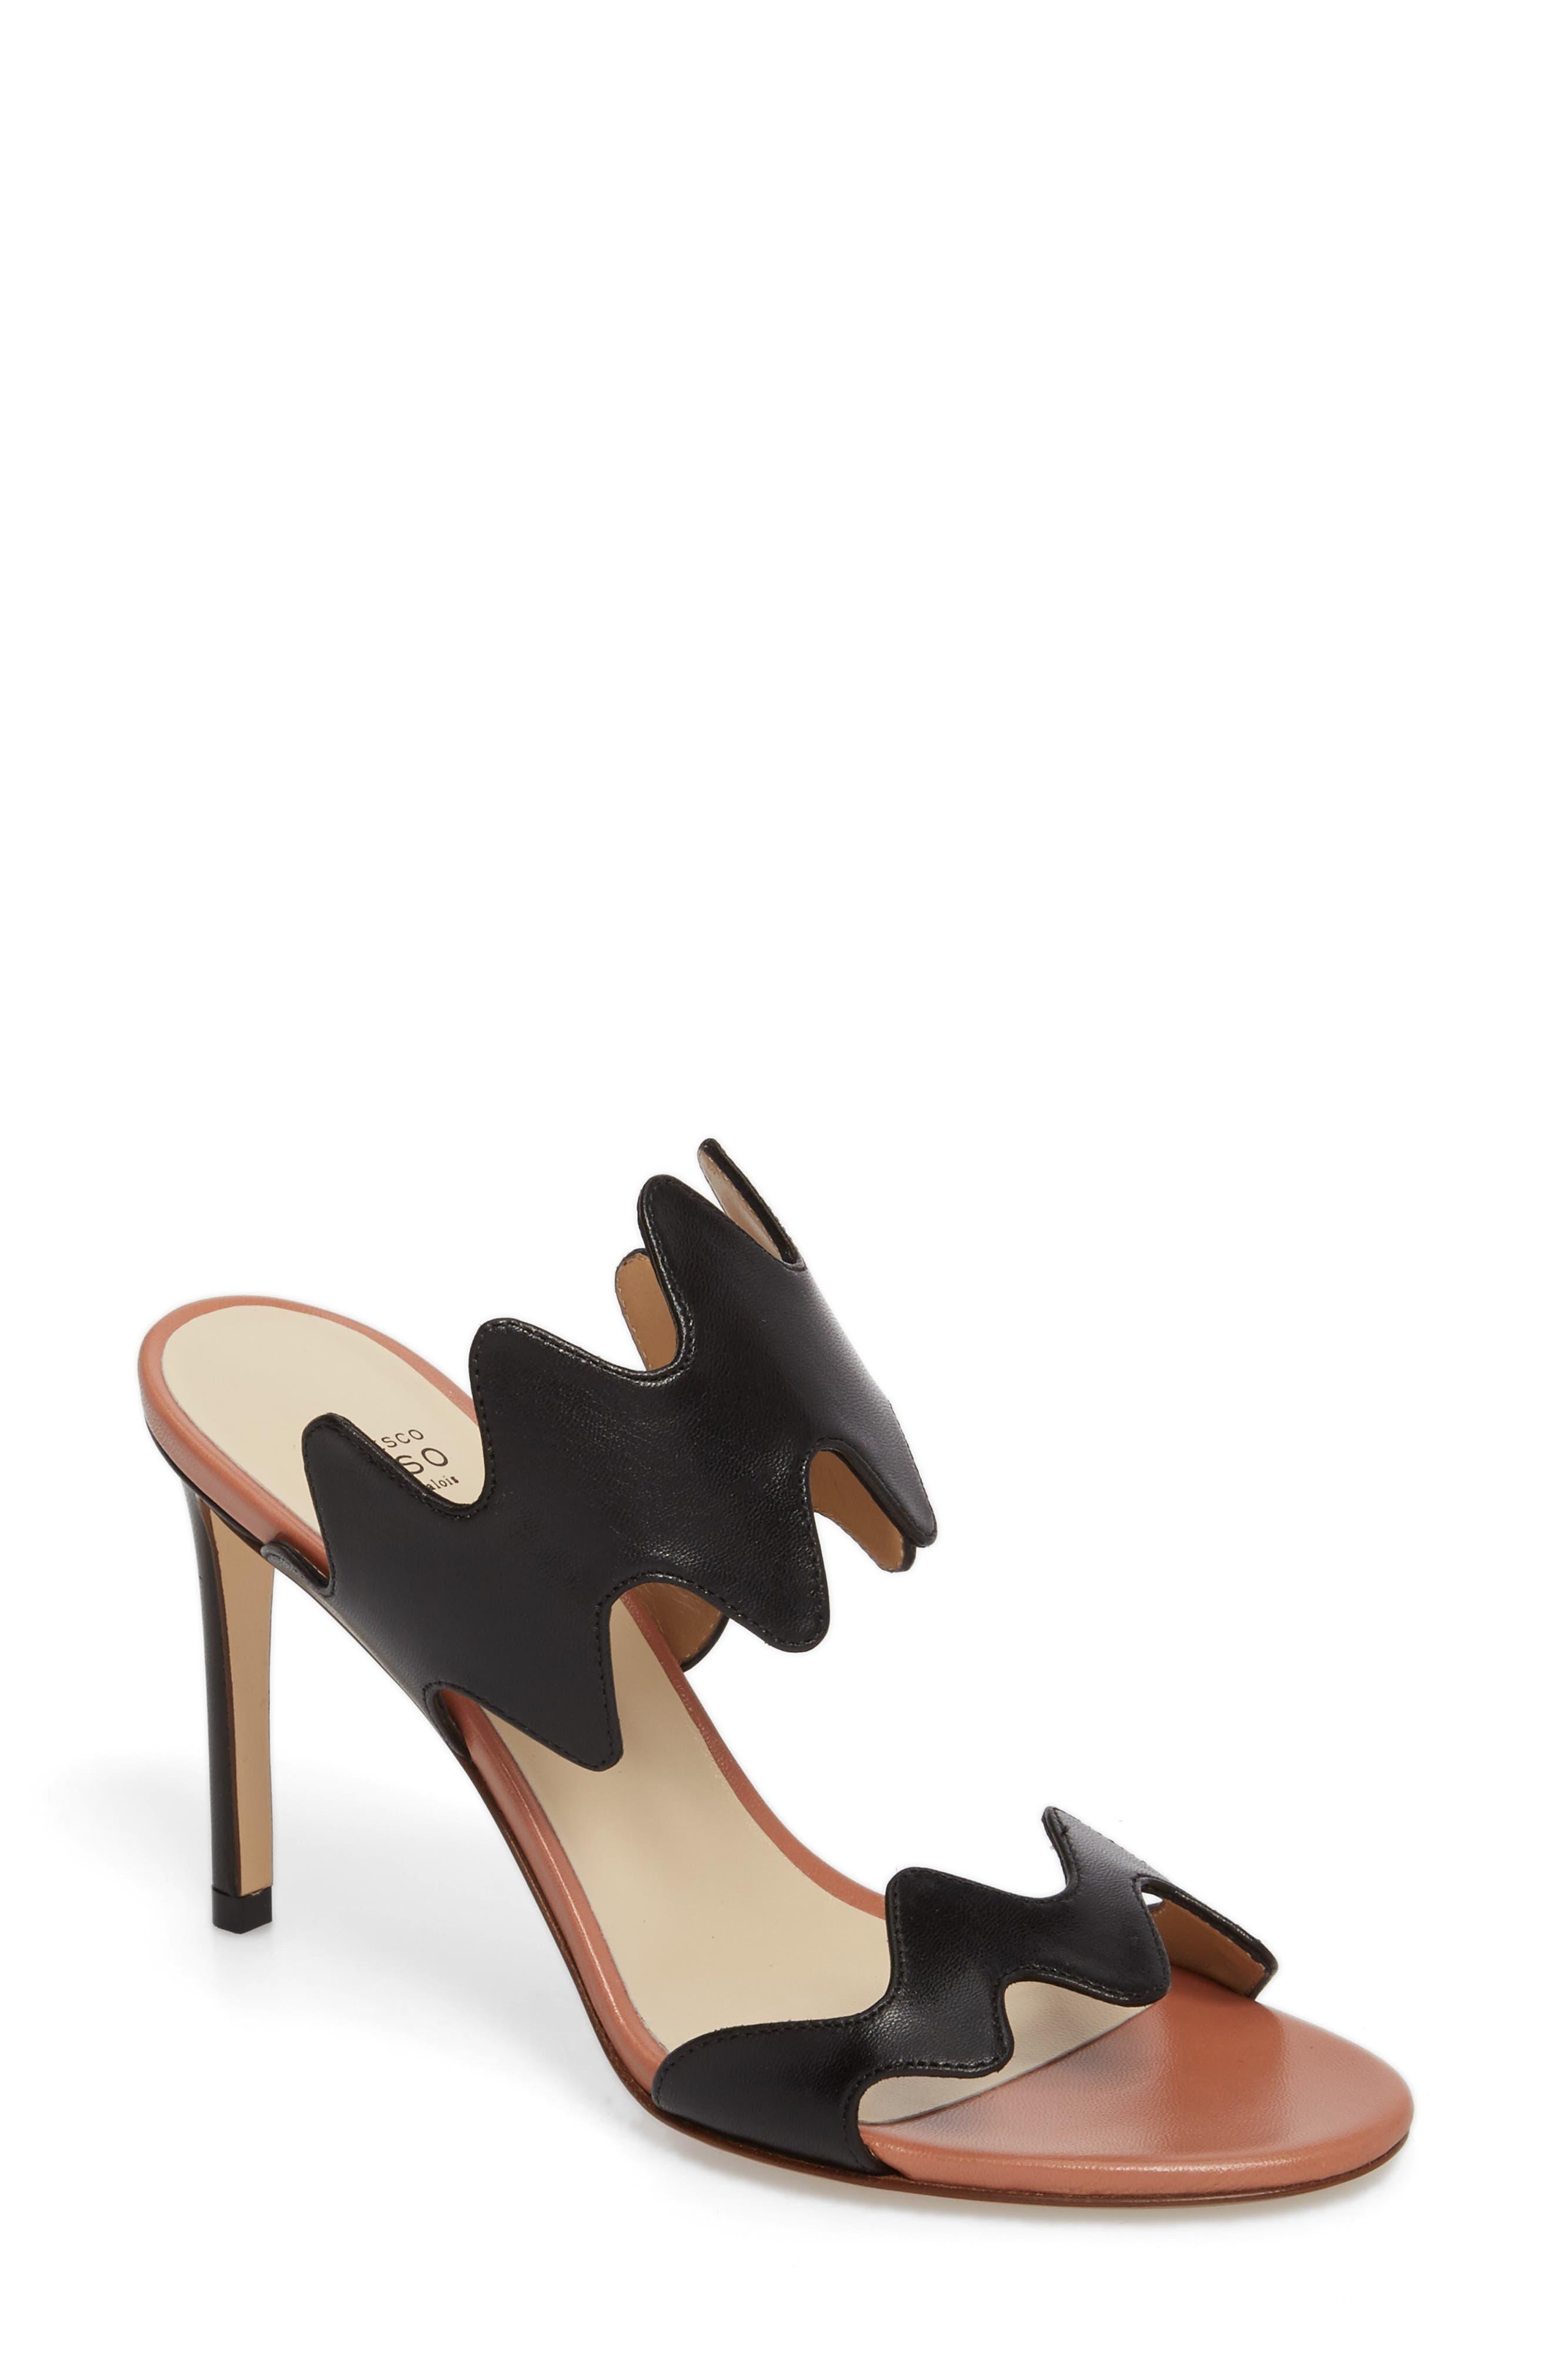 Alternate Image 1 Selected - Francesco Russo Zigzag Sandal (Women)